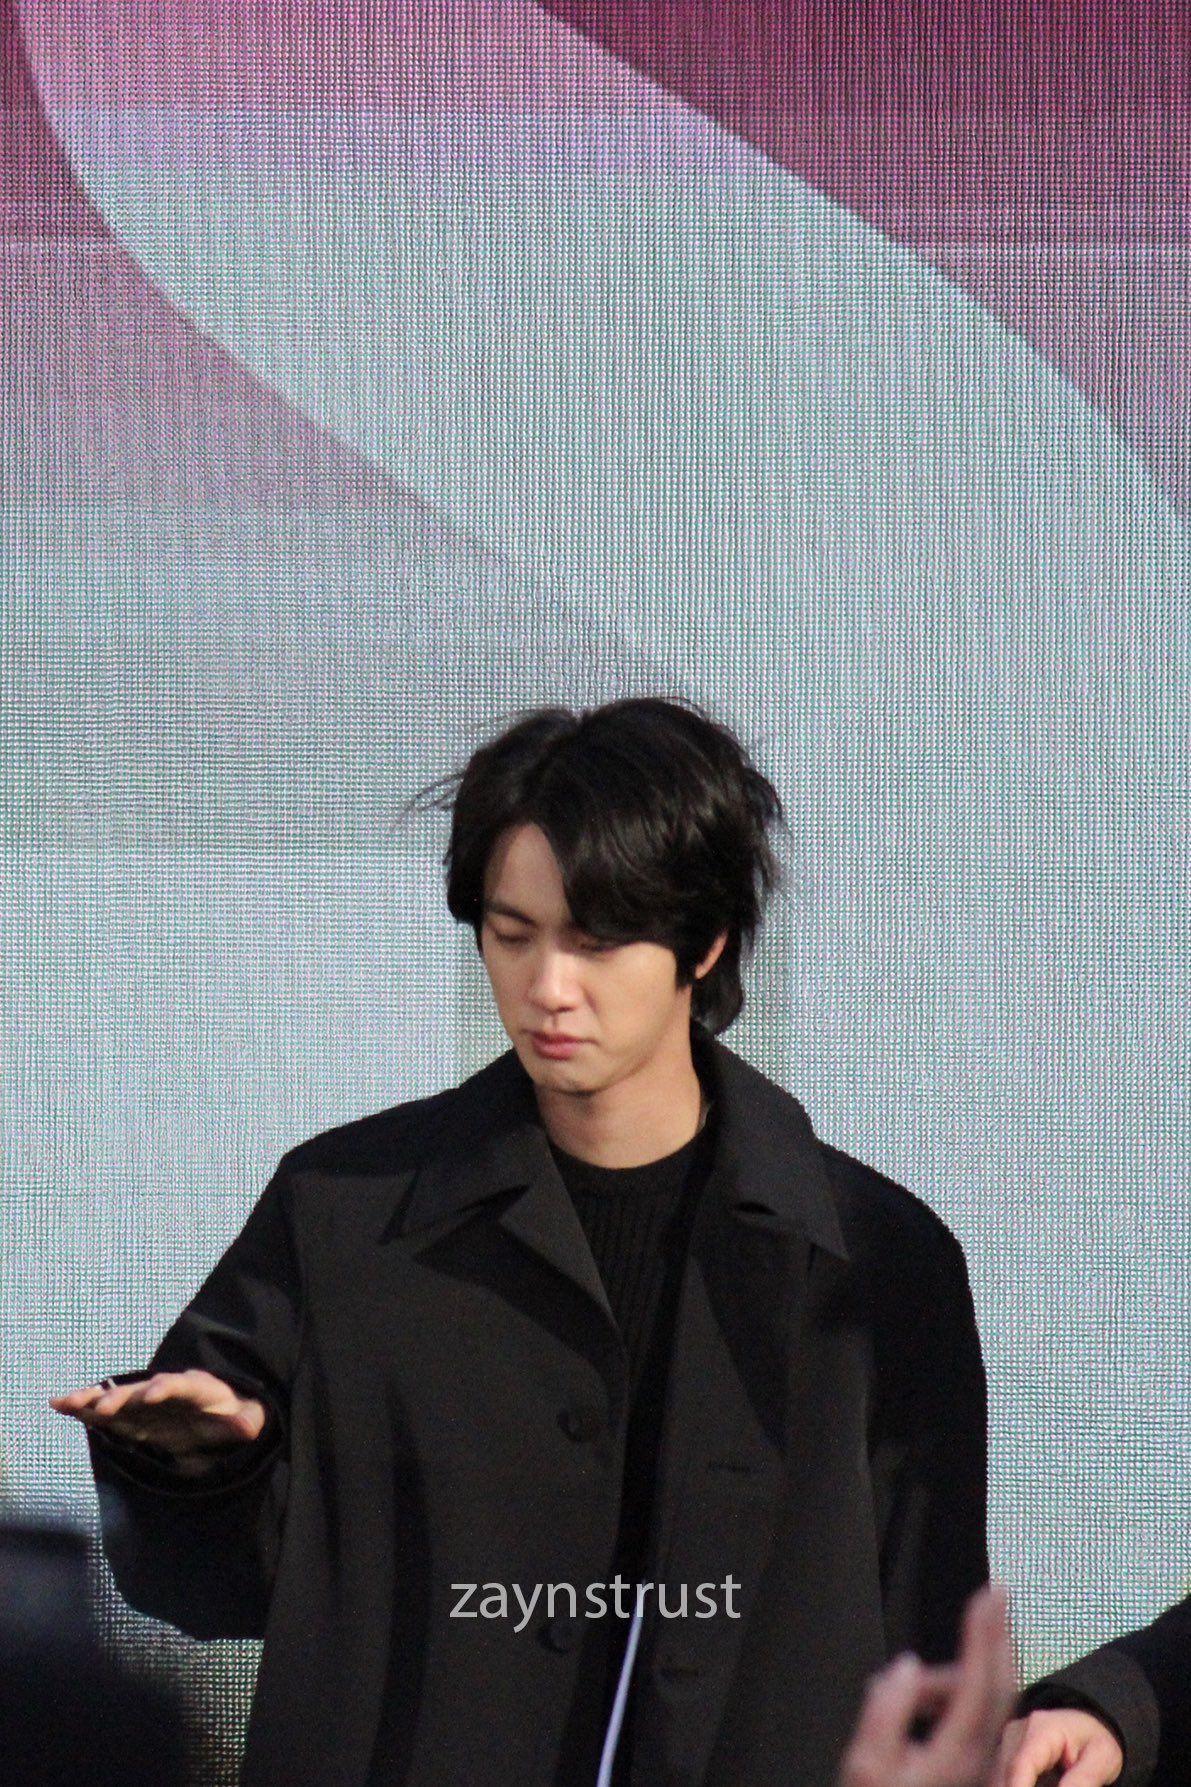 Mira On Twitter In 2020 Boys Long Hairstyles Bts Long Hair Styles Men